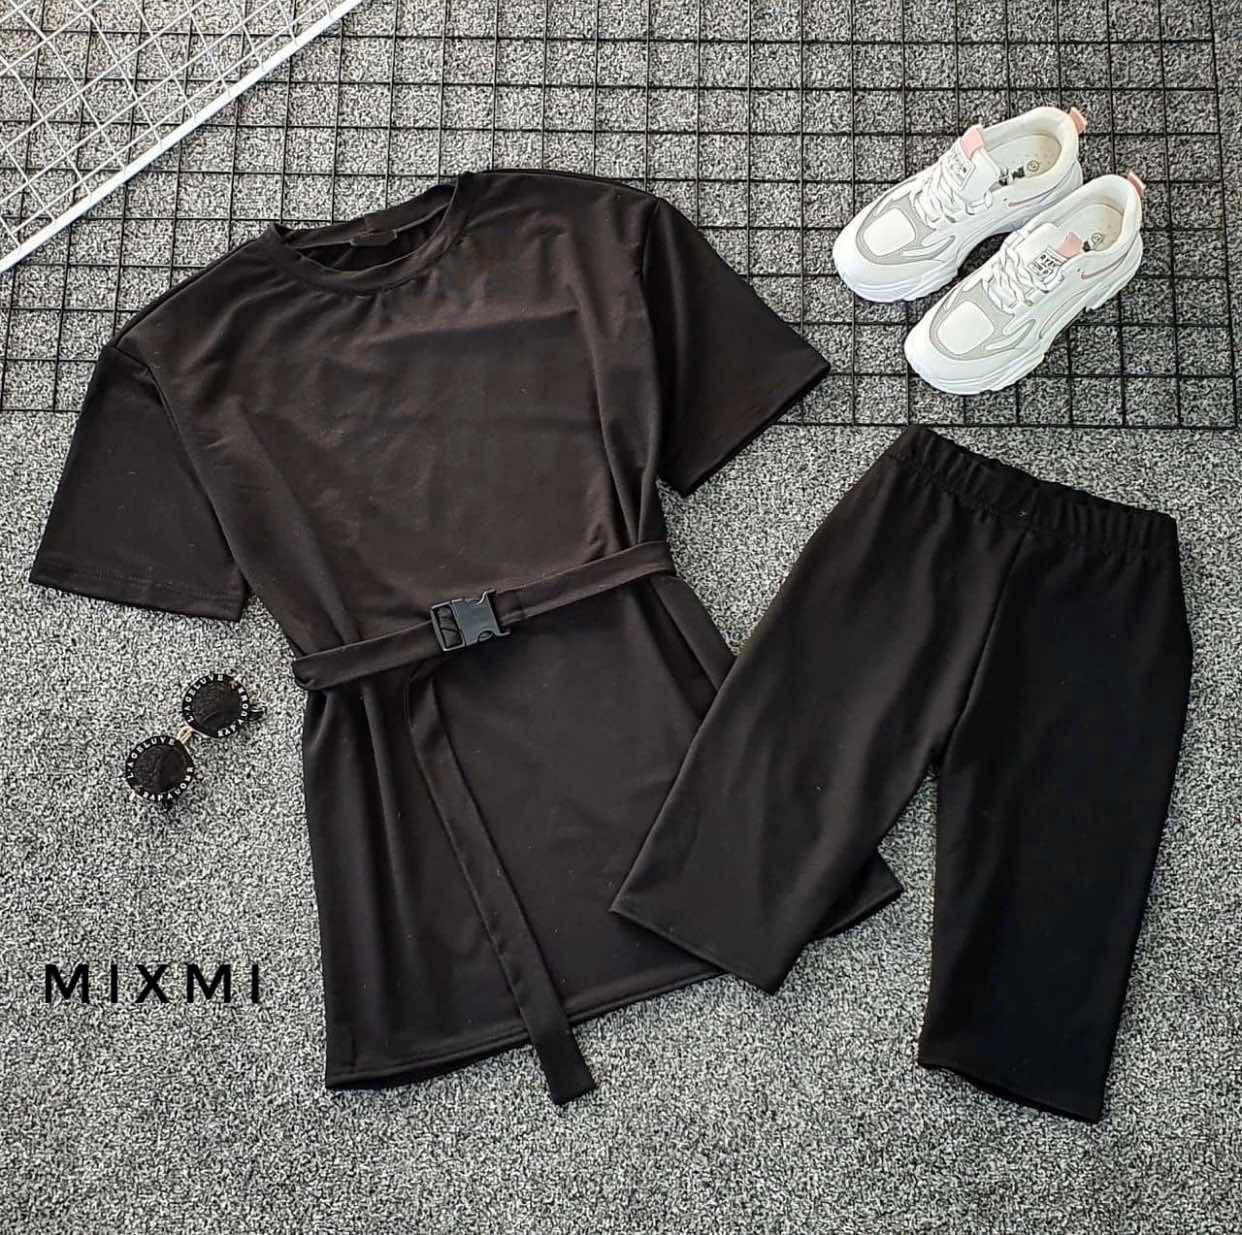 Жіночий костюм, двунить, р-р 42-44; 44-46 (чорний)